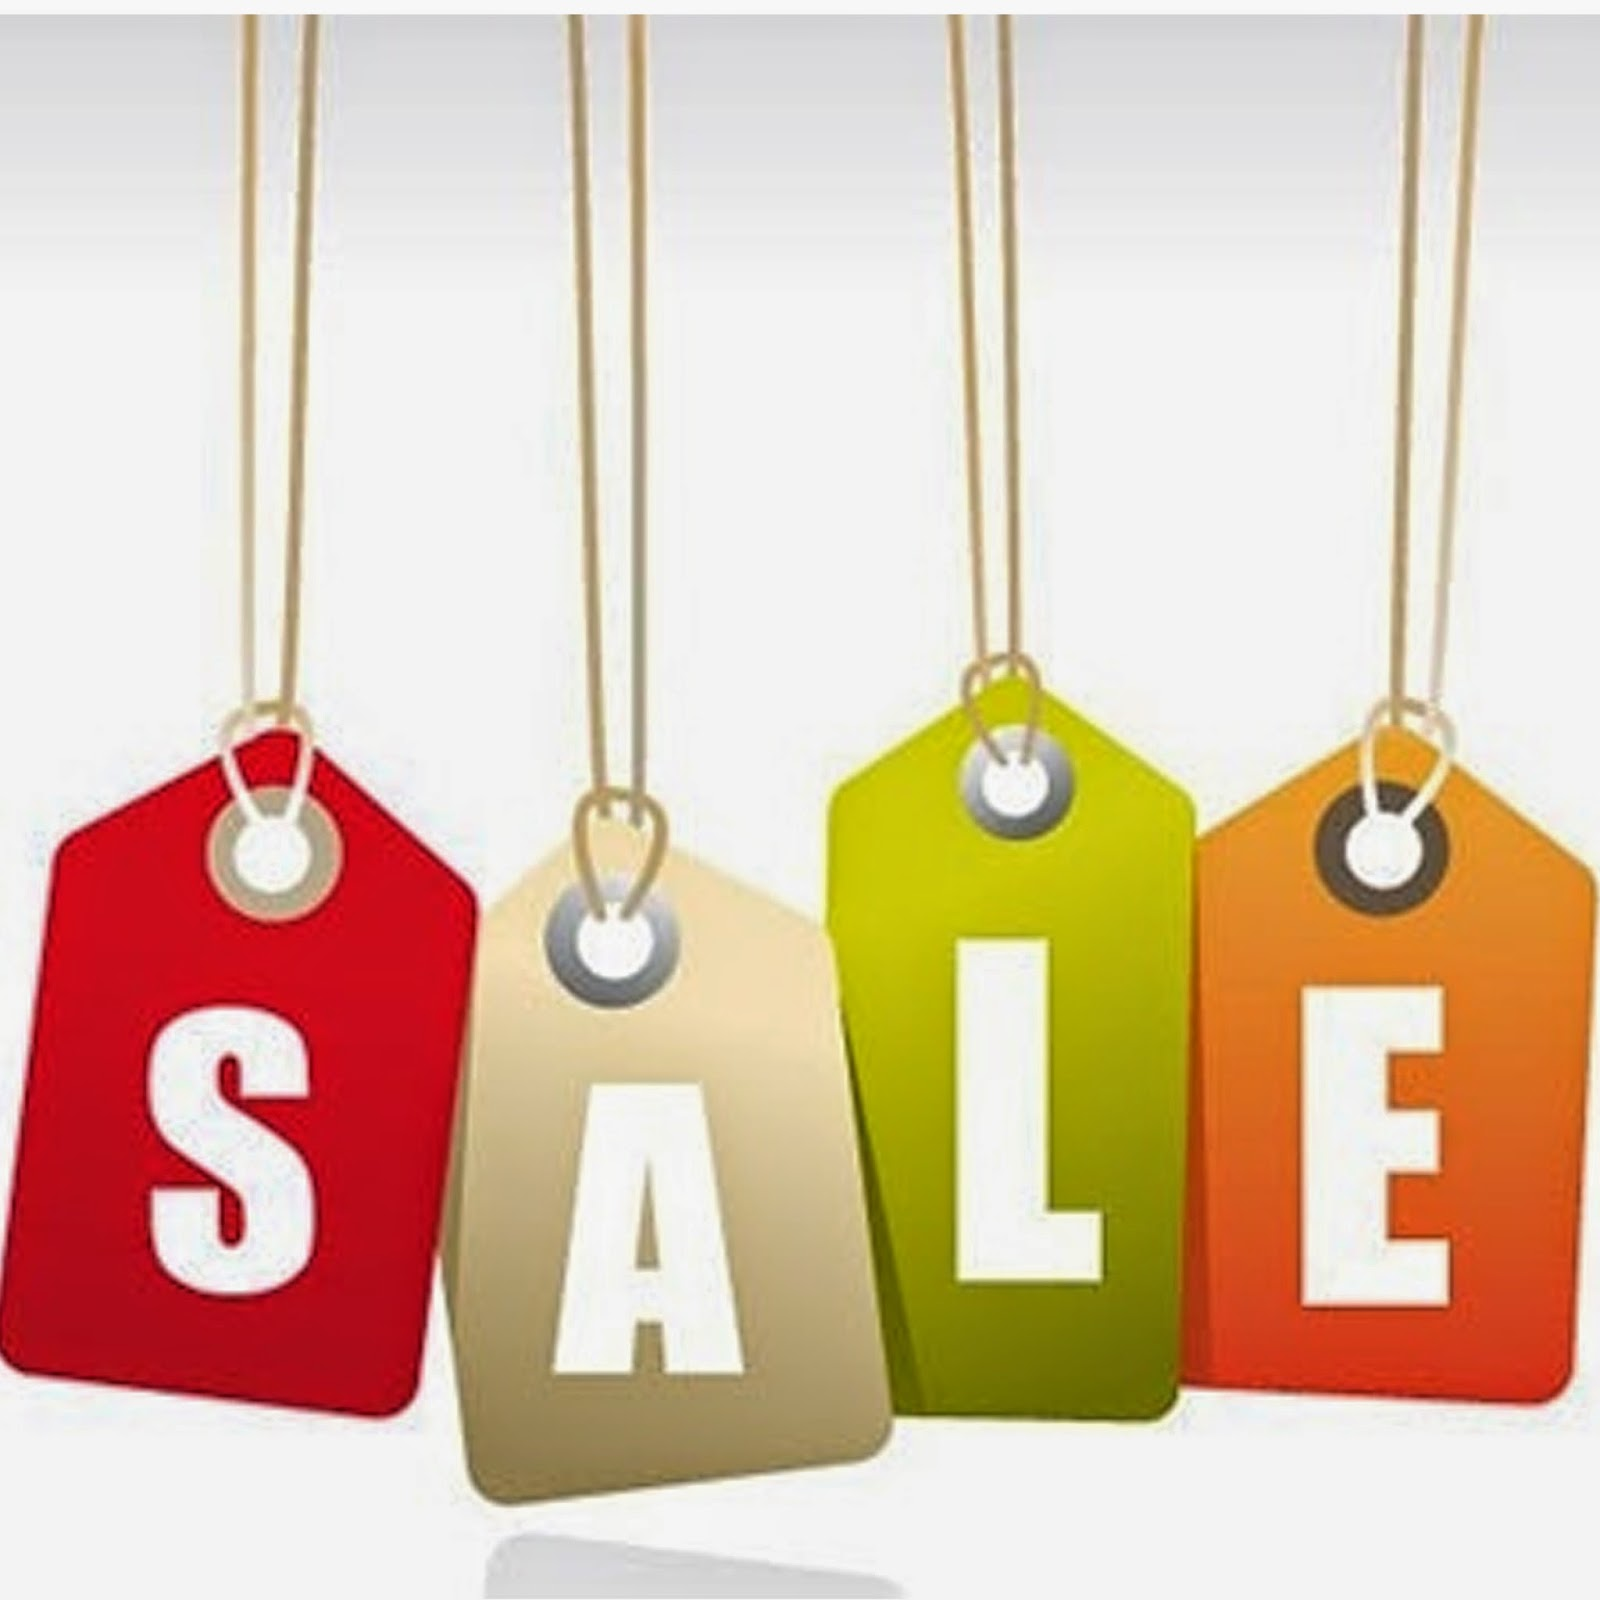 Crazy Quilt Girl Fabric Shop Big Fall Sale on Moda Fabric, Charm Packs, Jelly Rolls, Layer Cakes, Fat Quarter Bundles, Fat Eighth Bundles, Mini Charm Packs, Quilt Kits